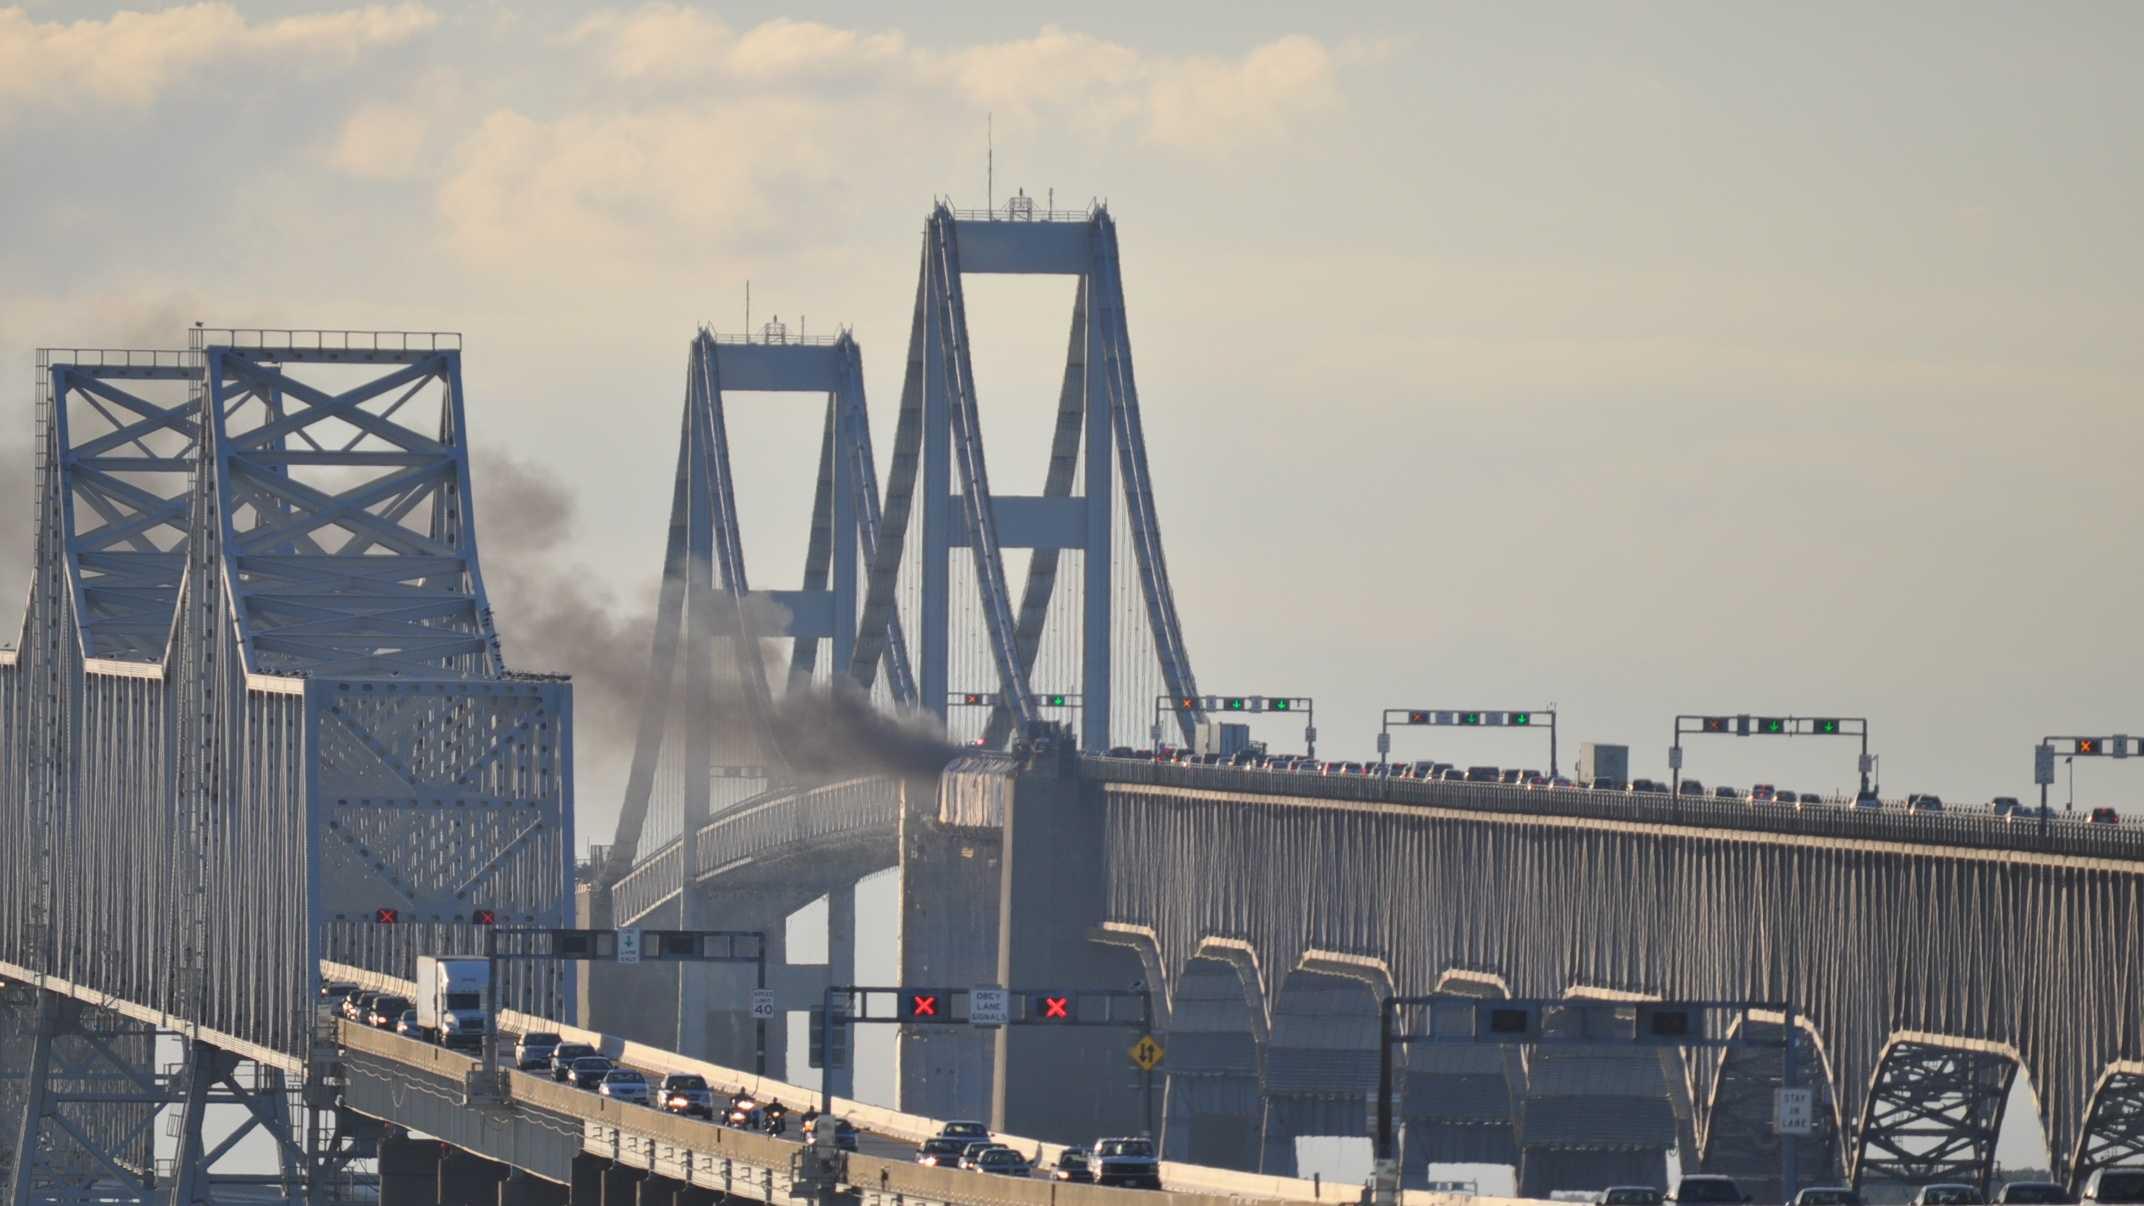 Chesapeake Bay Bridge fire